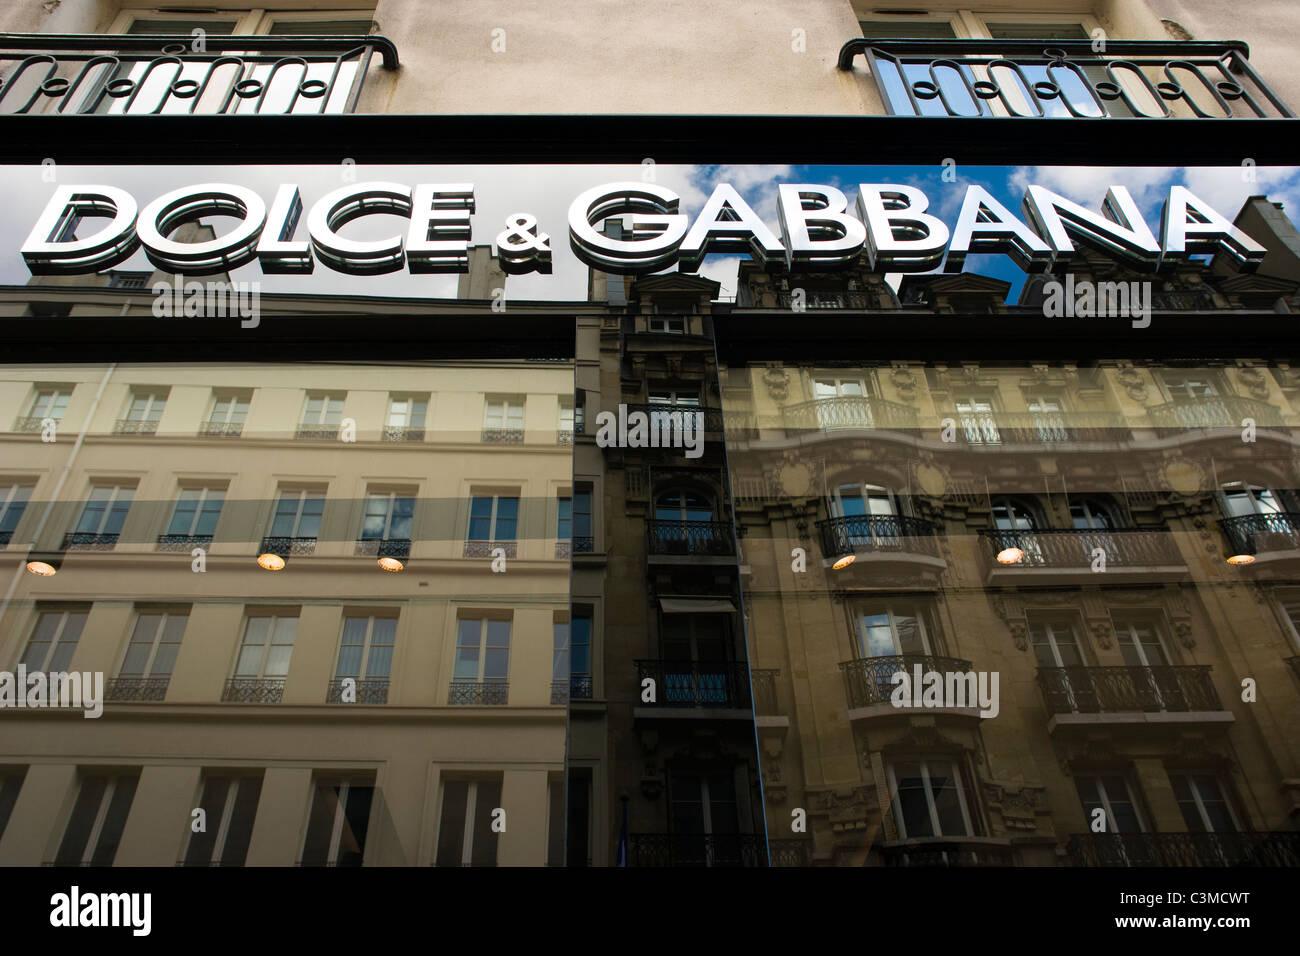 Dolce & Gabbana at 6 Rue Fbg St Honoré Paris France - Stock Image